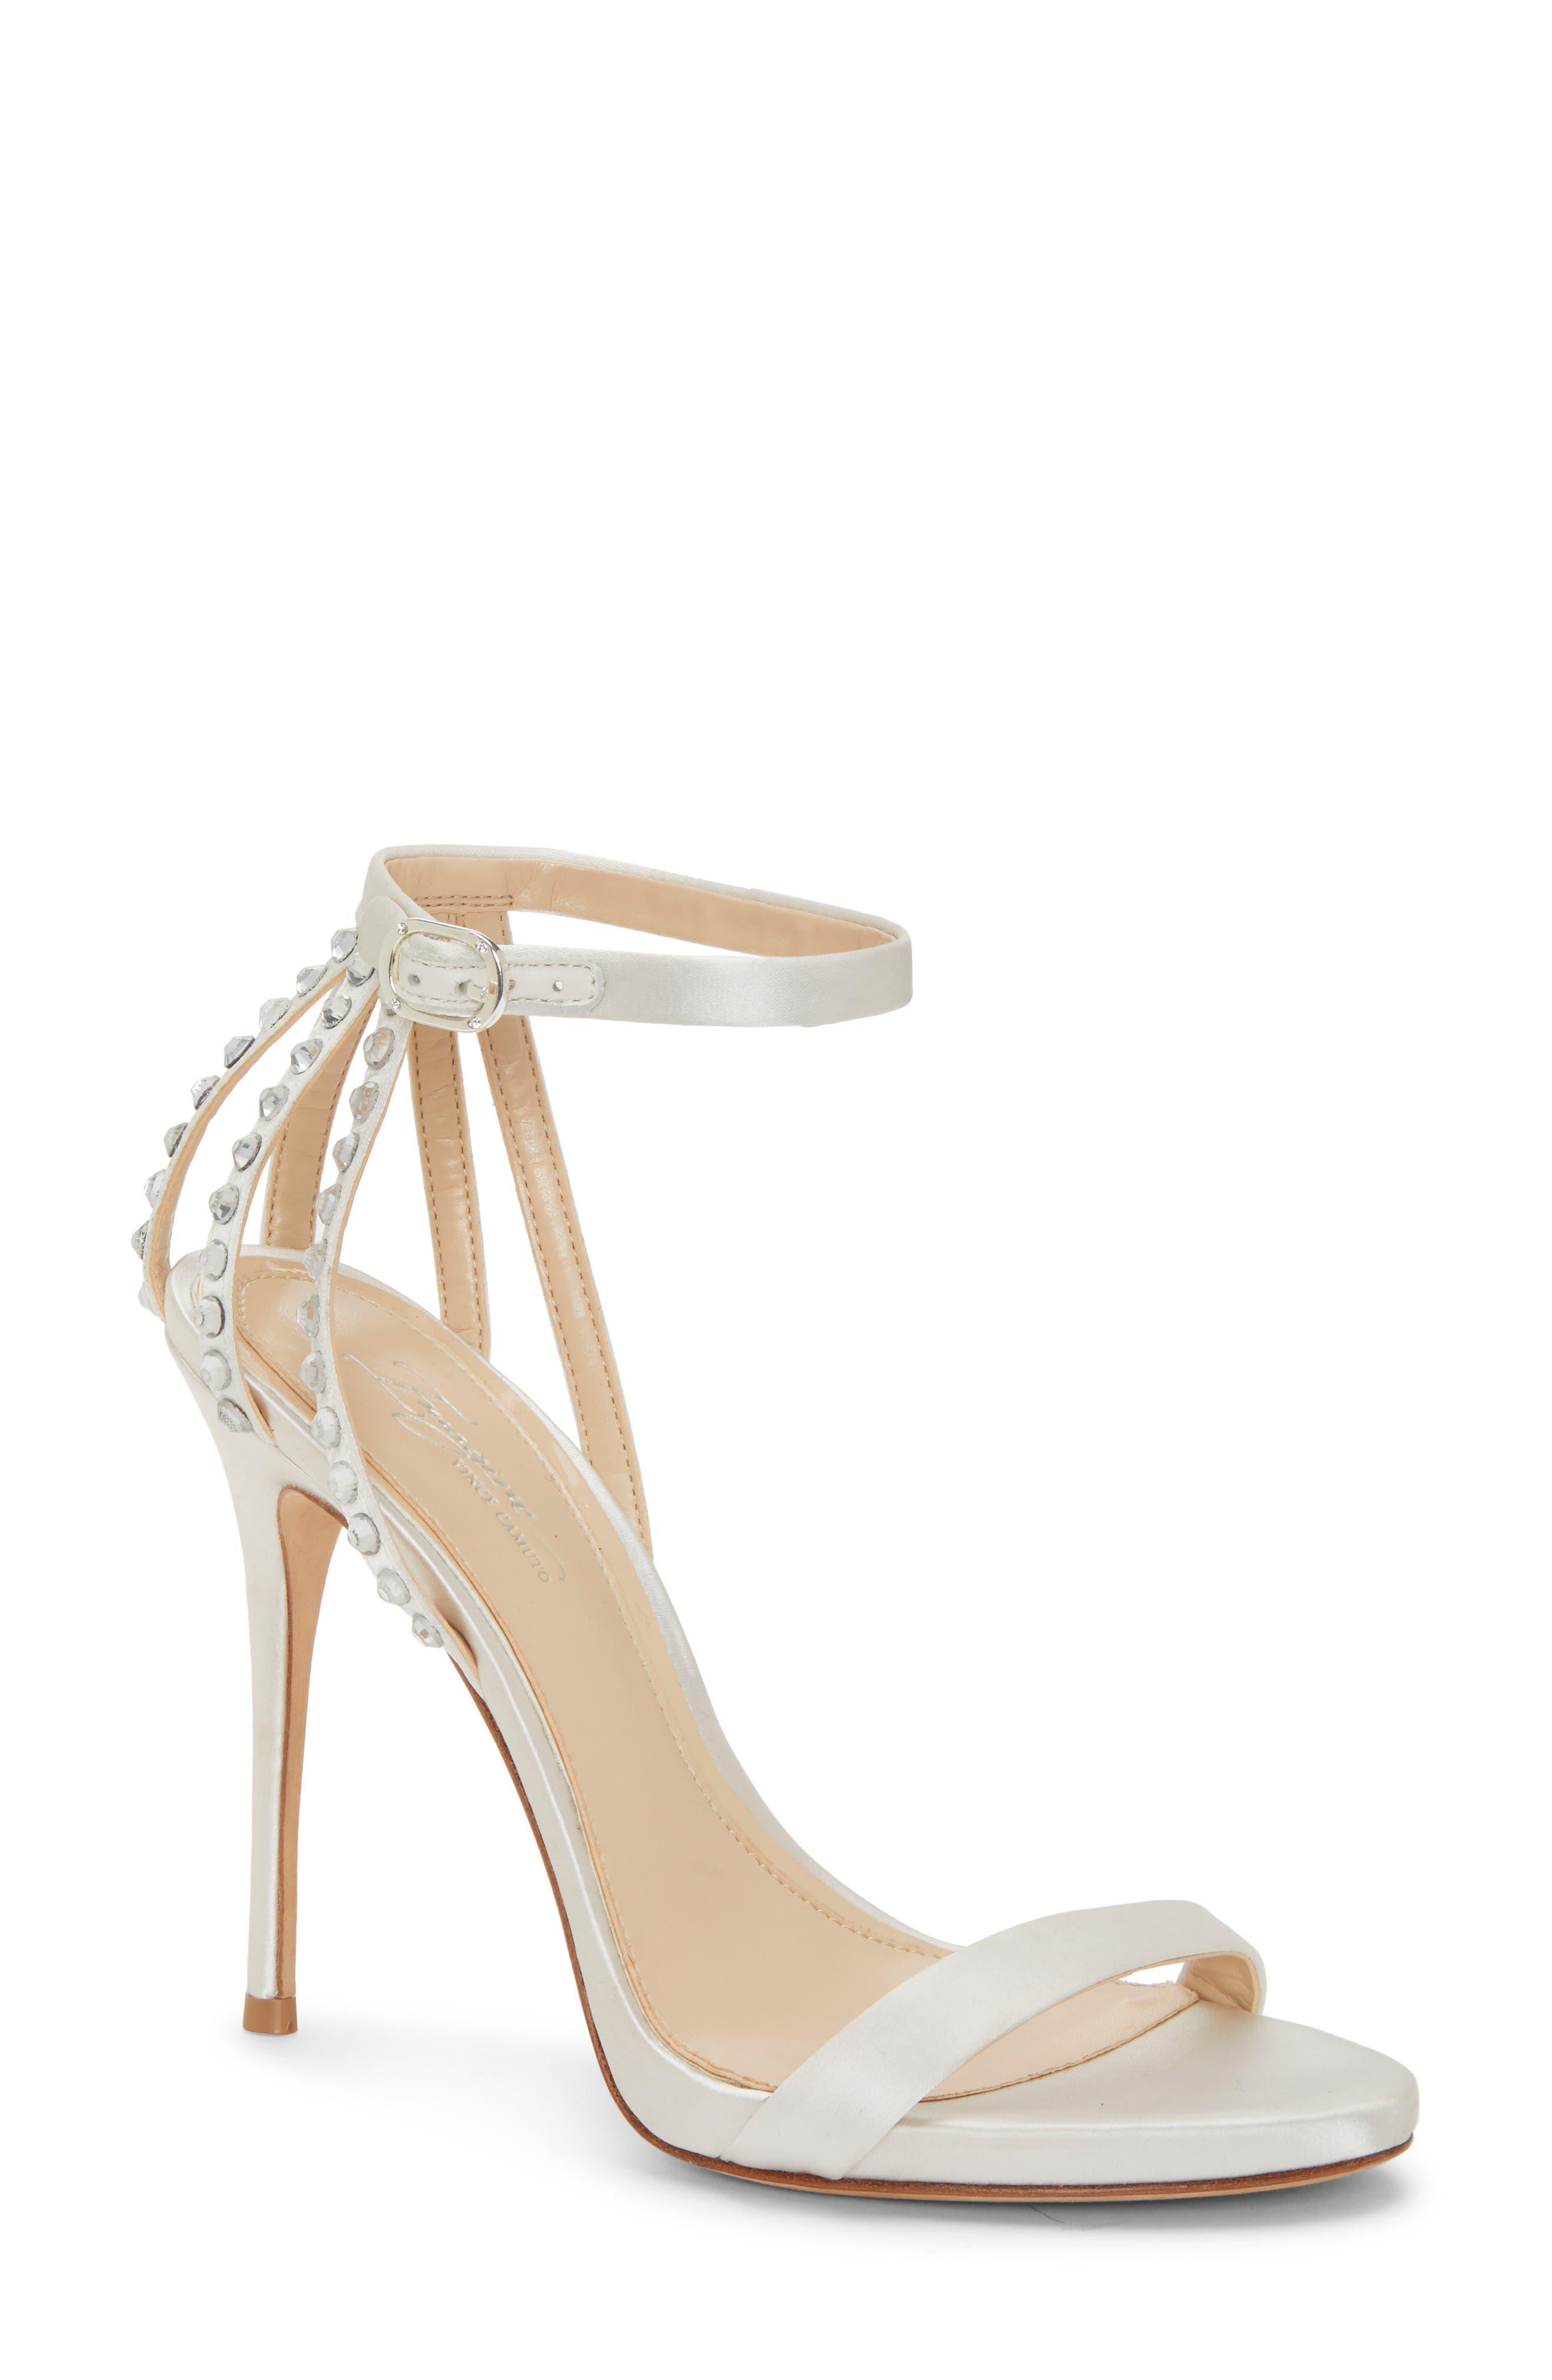 e18193c98e03 Imagine By Vince Camuto Daphee Crystal Embellished Sandal